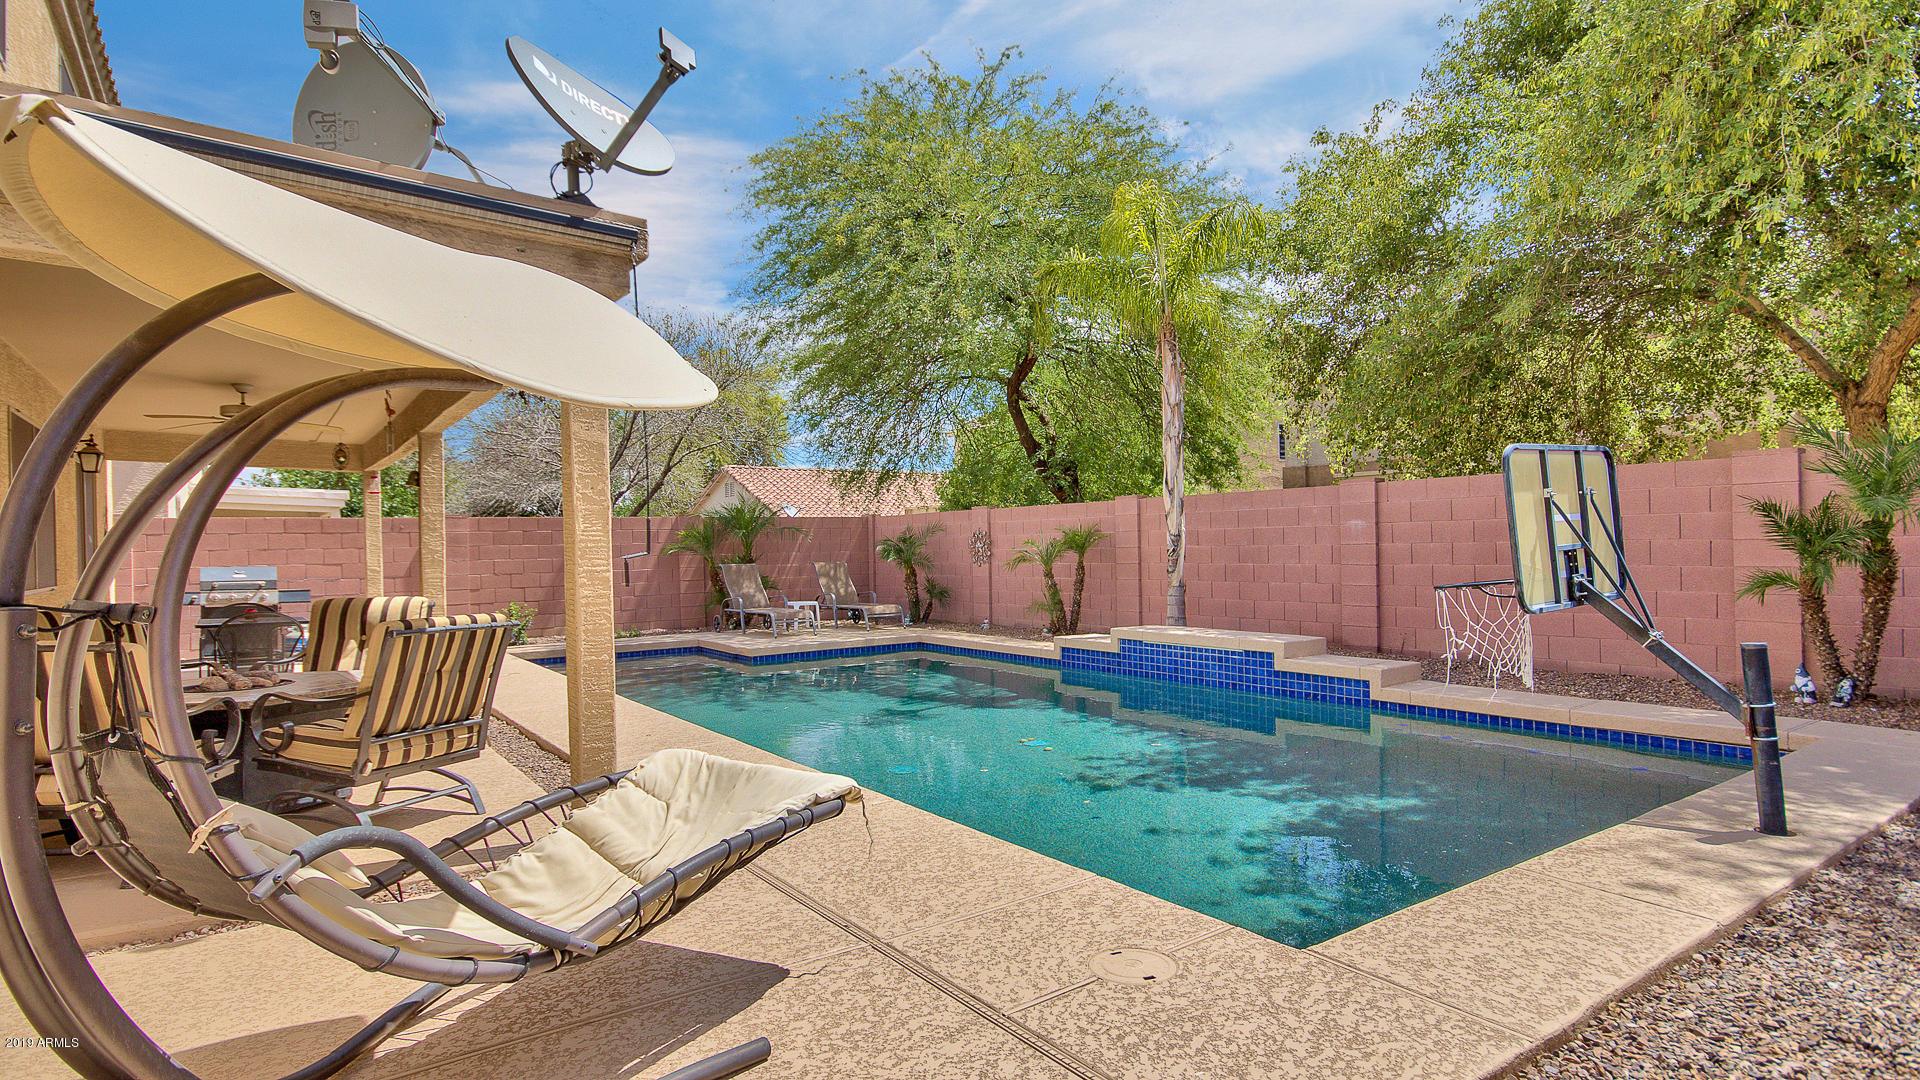 MLS 5929075 33075 N MADISON WAY Drive, Queen Creek, AZ 85142 Queen Creek AZ San Tan Heights